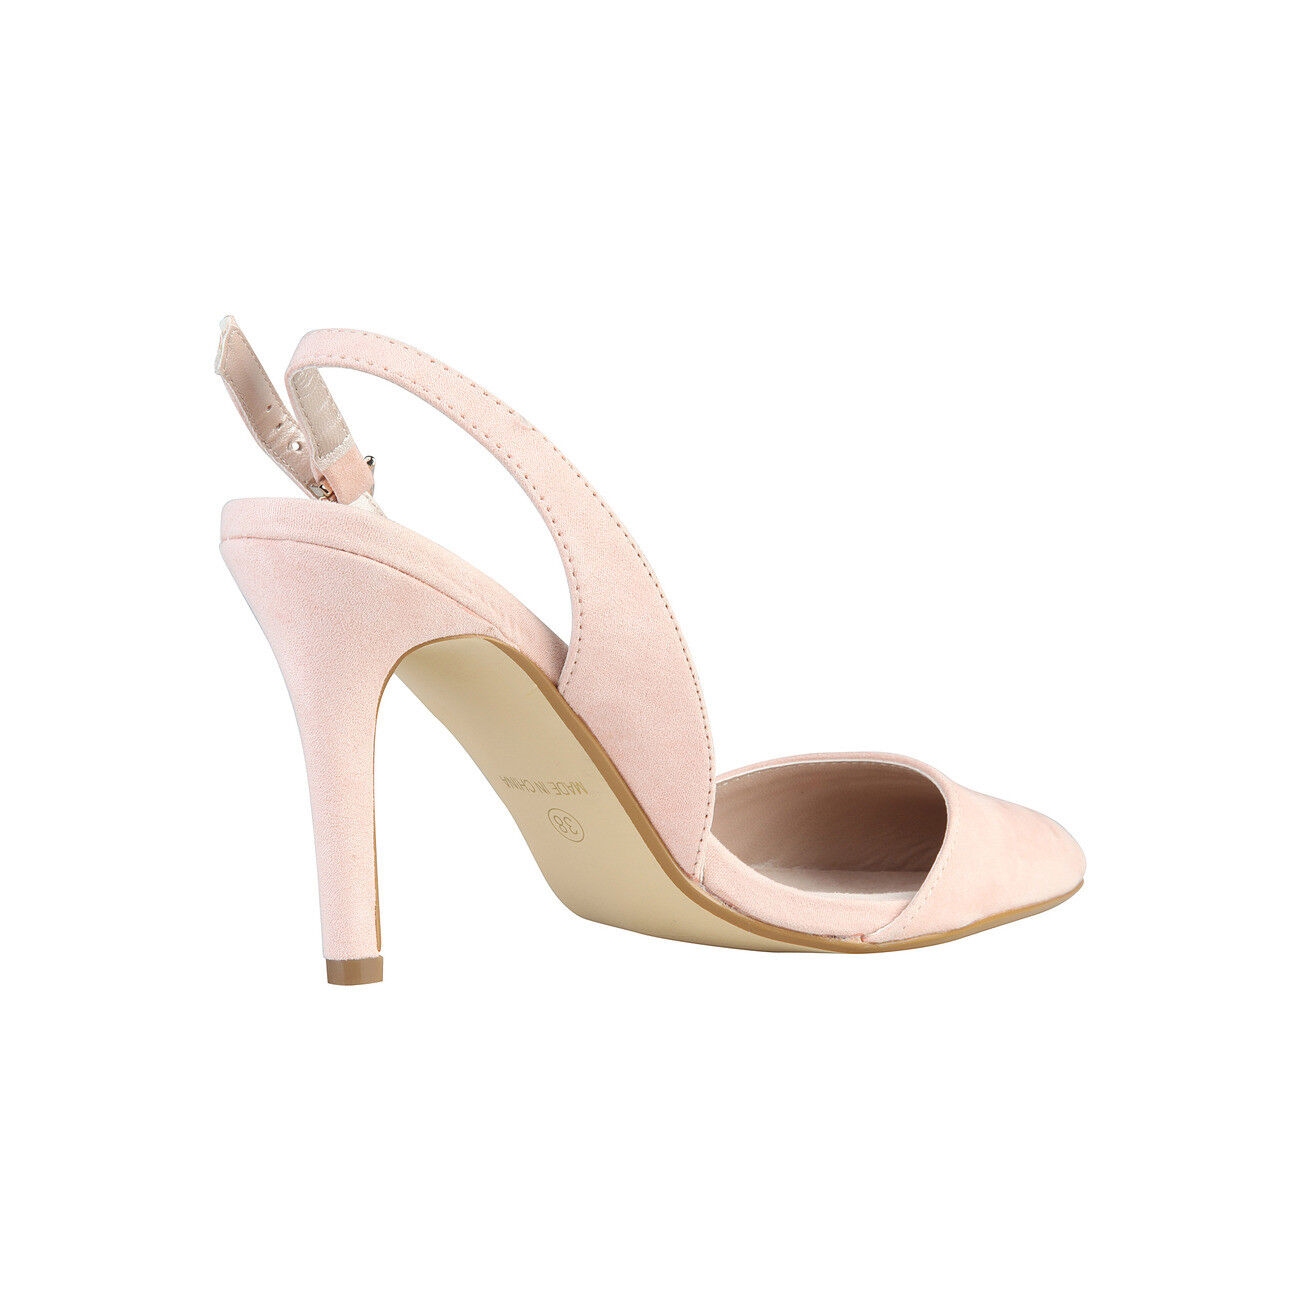 Motivi n139s0_07 Exclusive sandalias, señora sandalias, sandalias, Exclusive zapatos de salón, UE 37, rosadodo 3b43d8